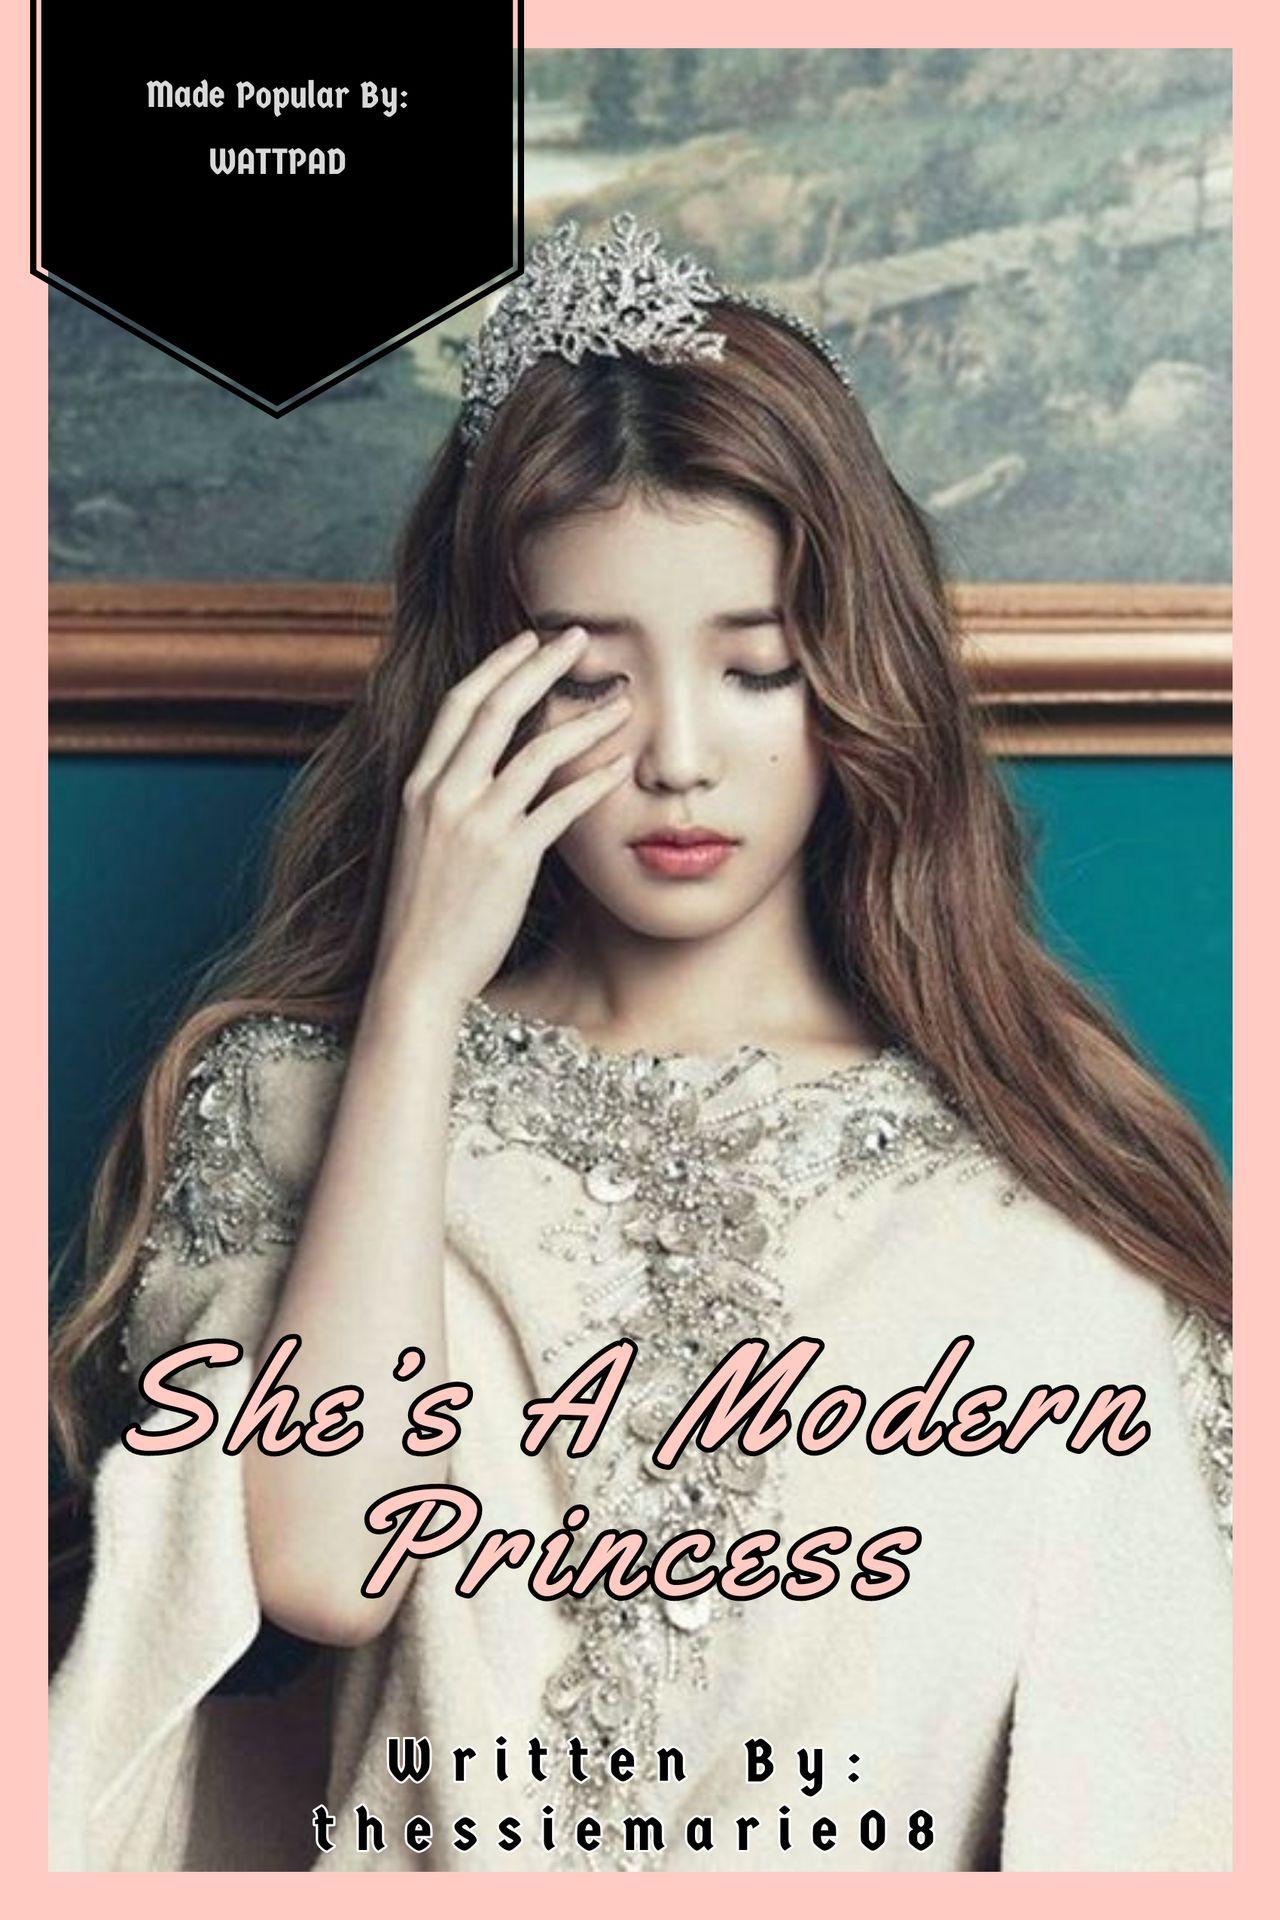 She S A Modern Princess Characters Wattpad Images, Photos, Reviews